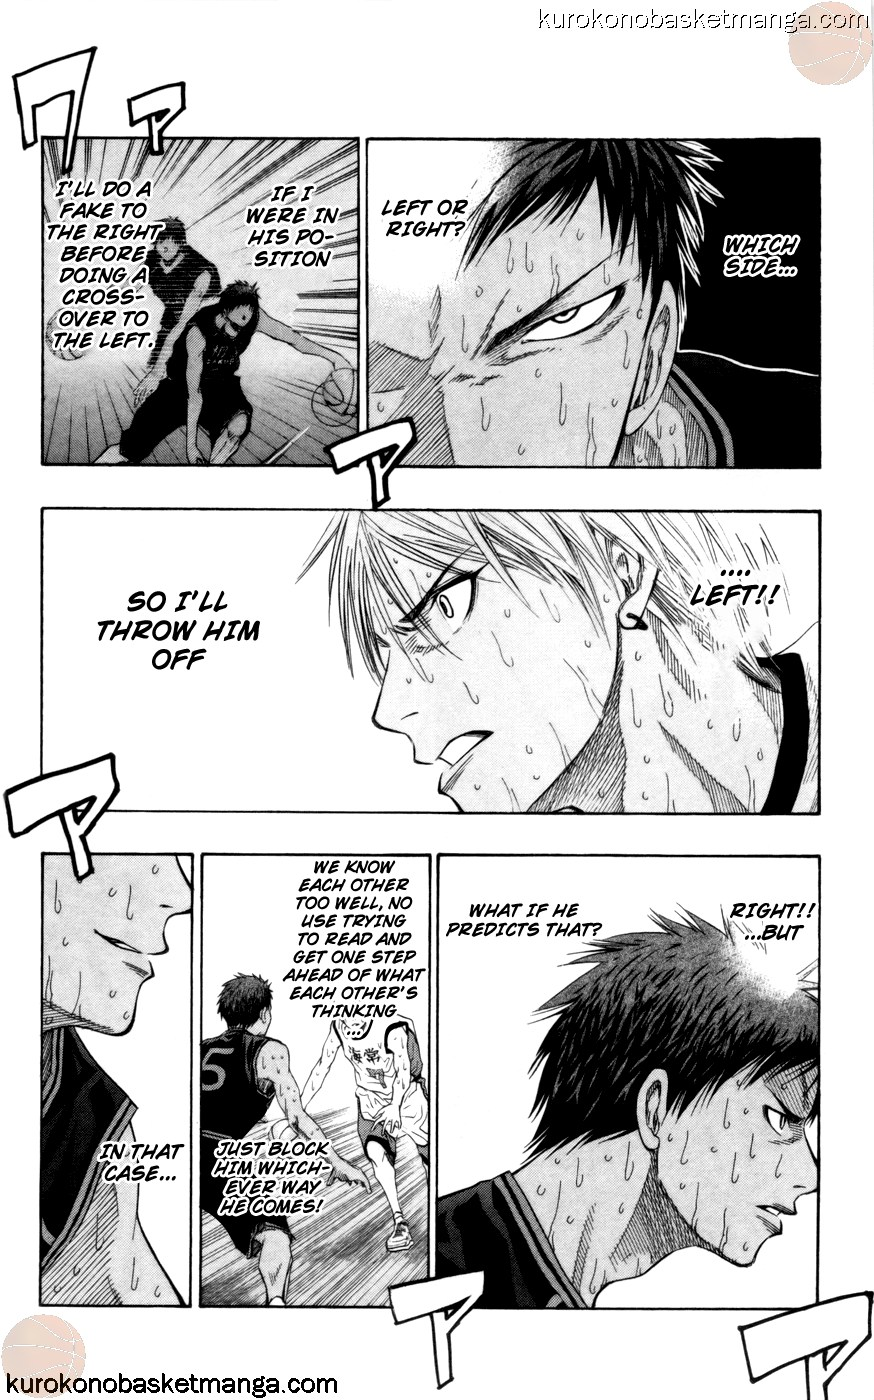 Kuroko no Basket Manga Chapter 72 - Image 02